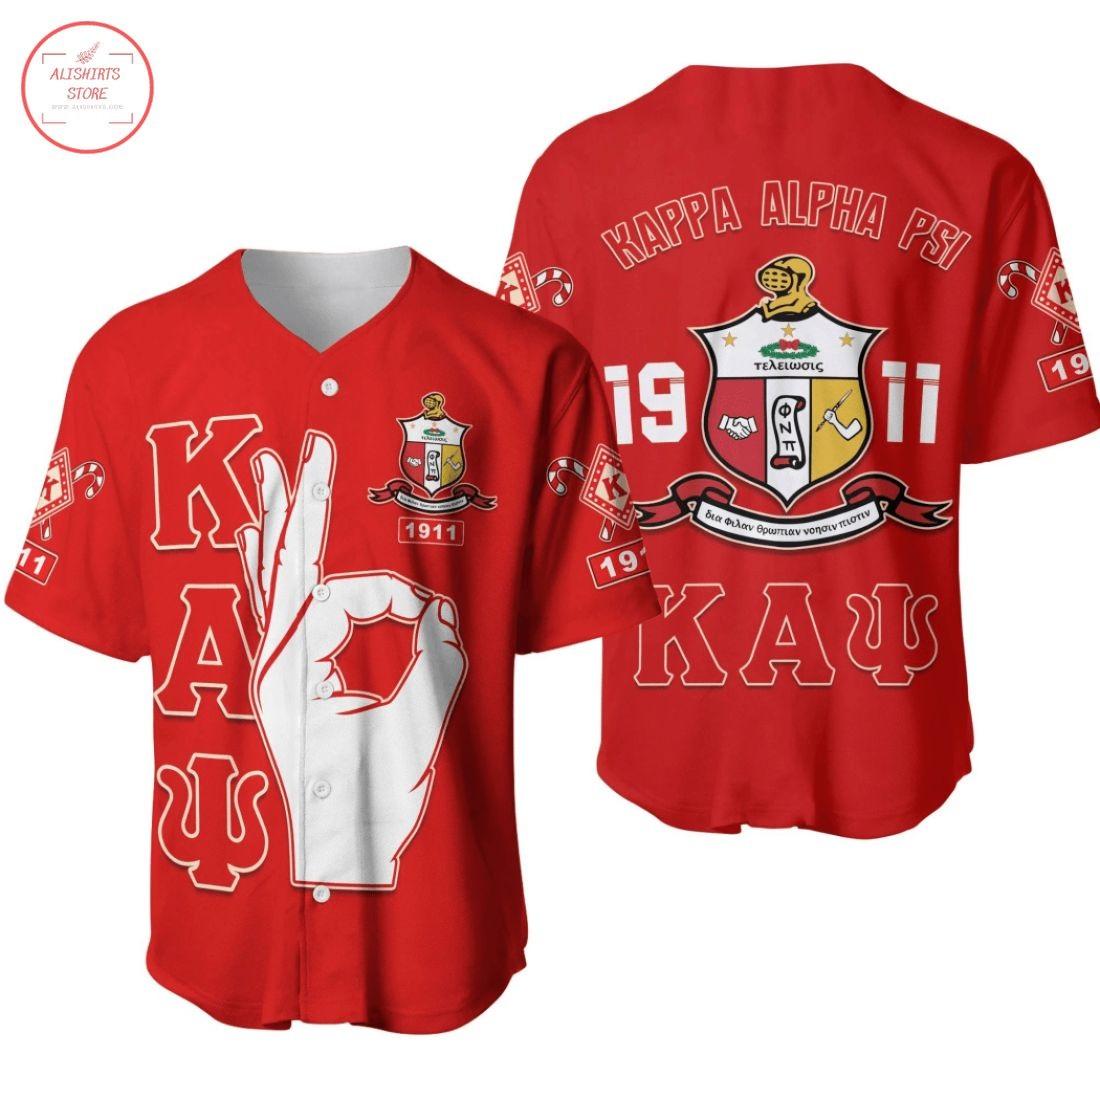 Kappa Alpha Psi 1911 Crest Hand Signal Baseball Jersey